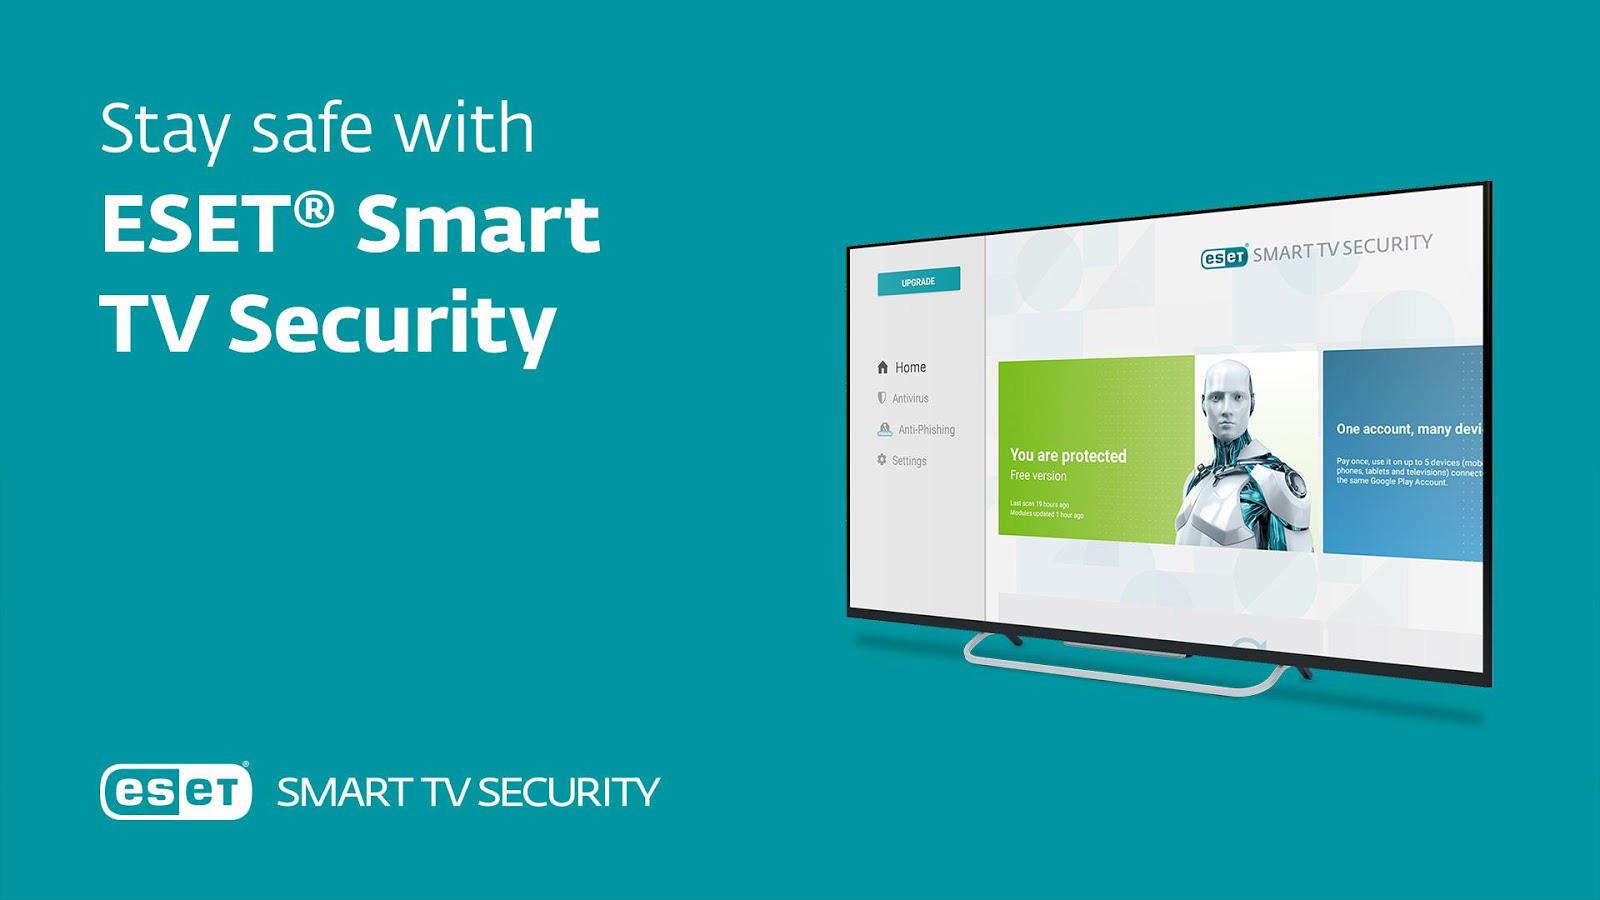 eset-smart-tv-security